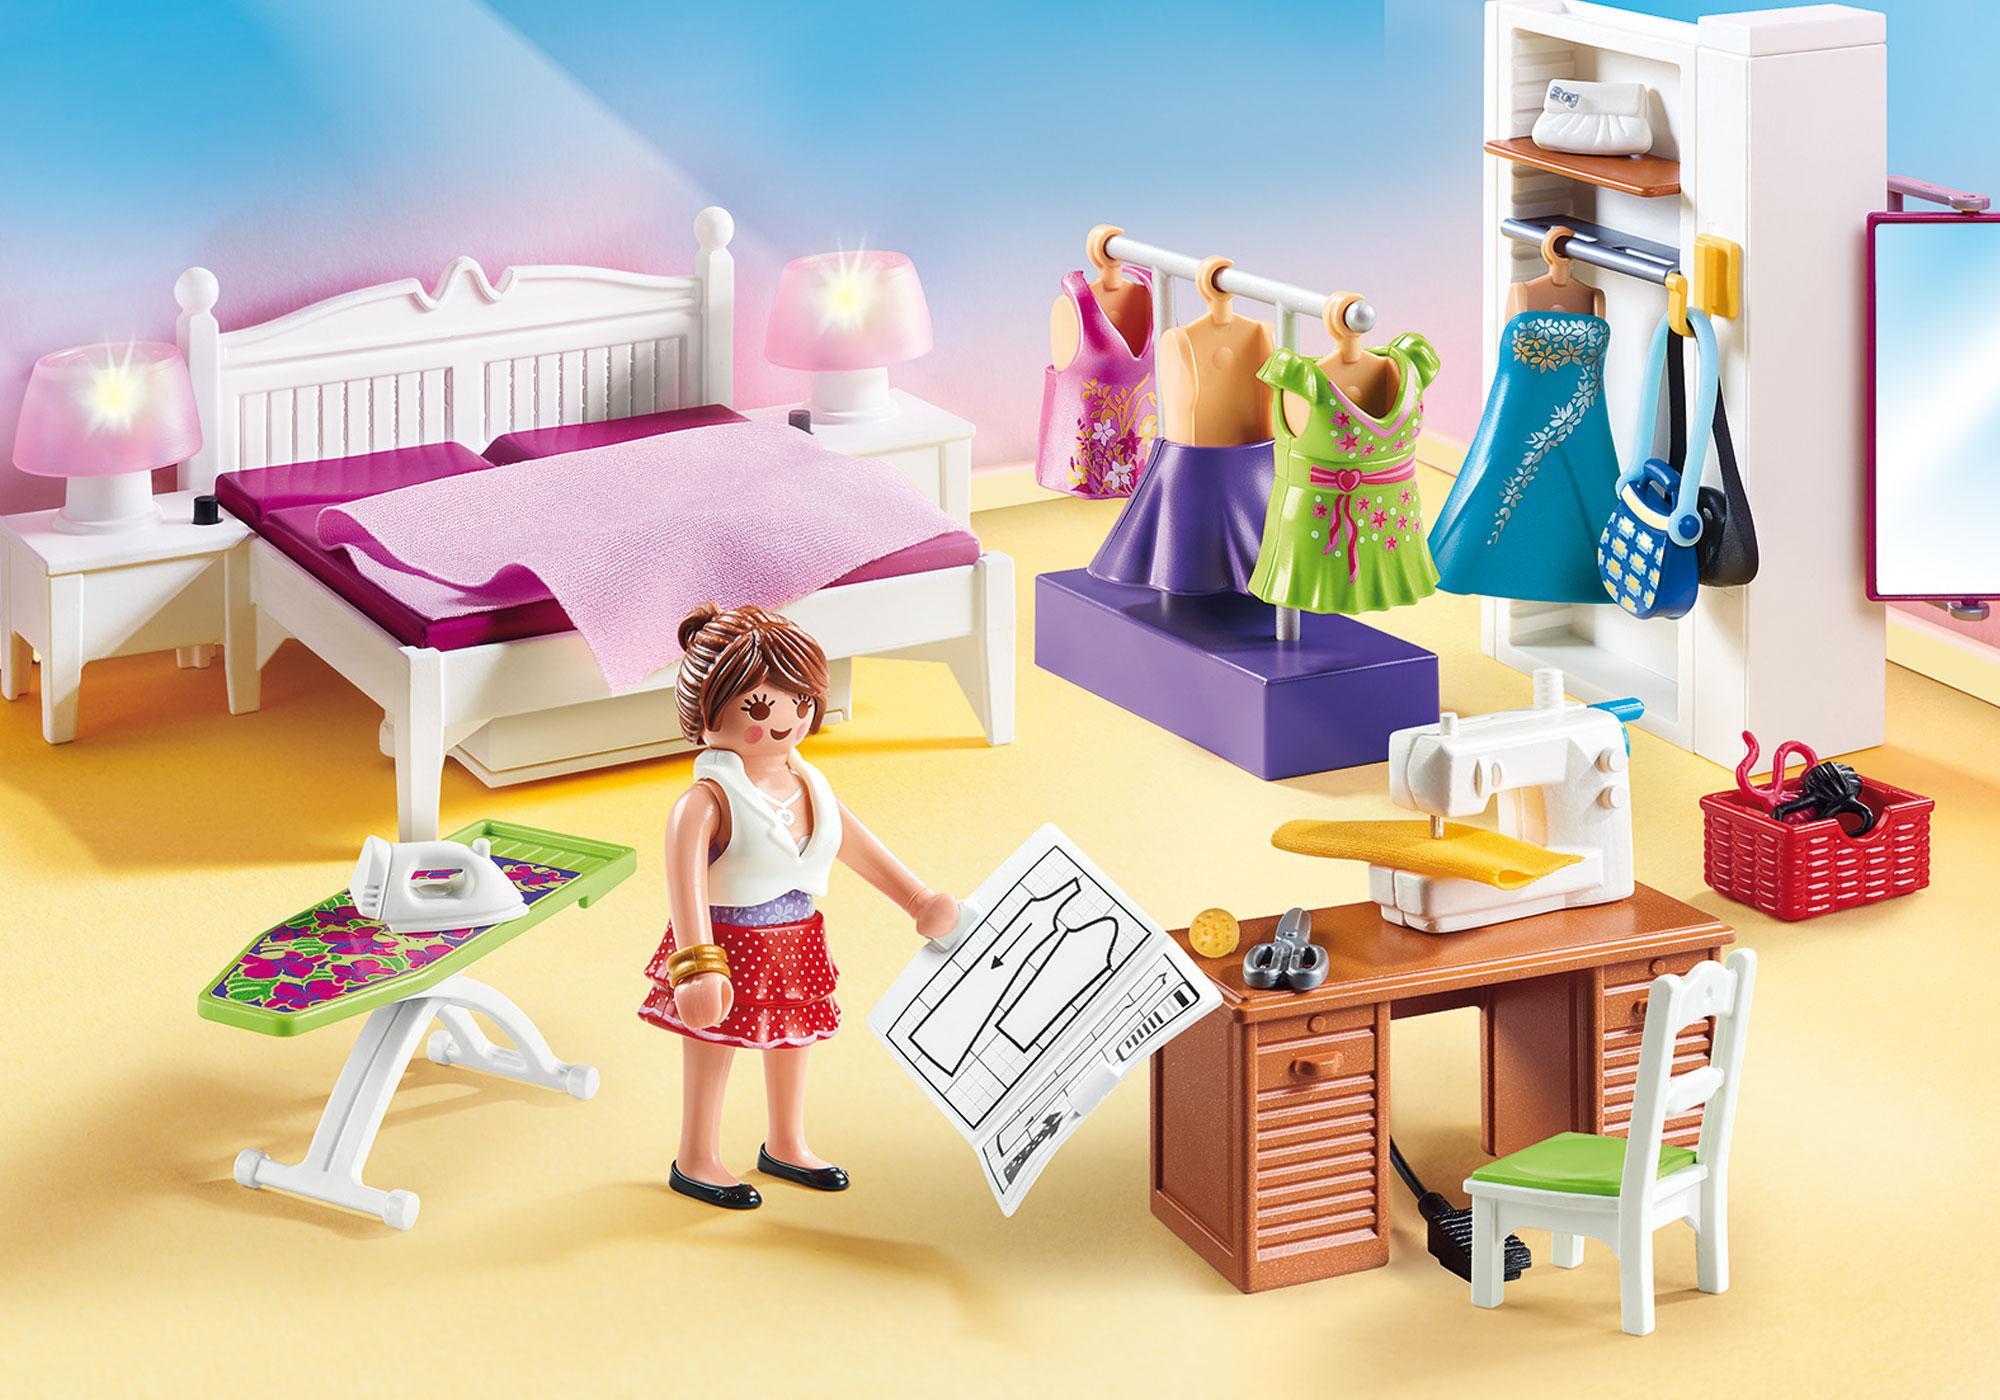 http://media.playmobil.com/i/playmobil/70208_product_detail/Chambre avec espace couture